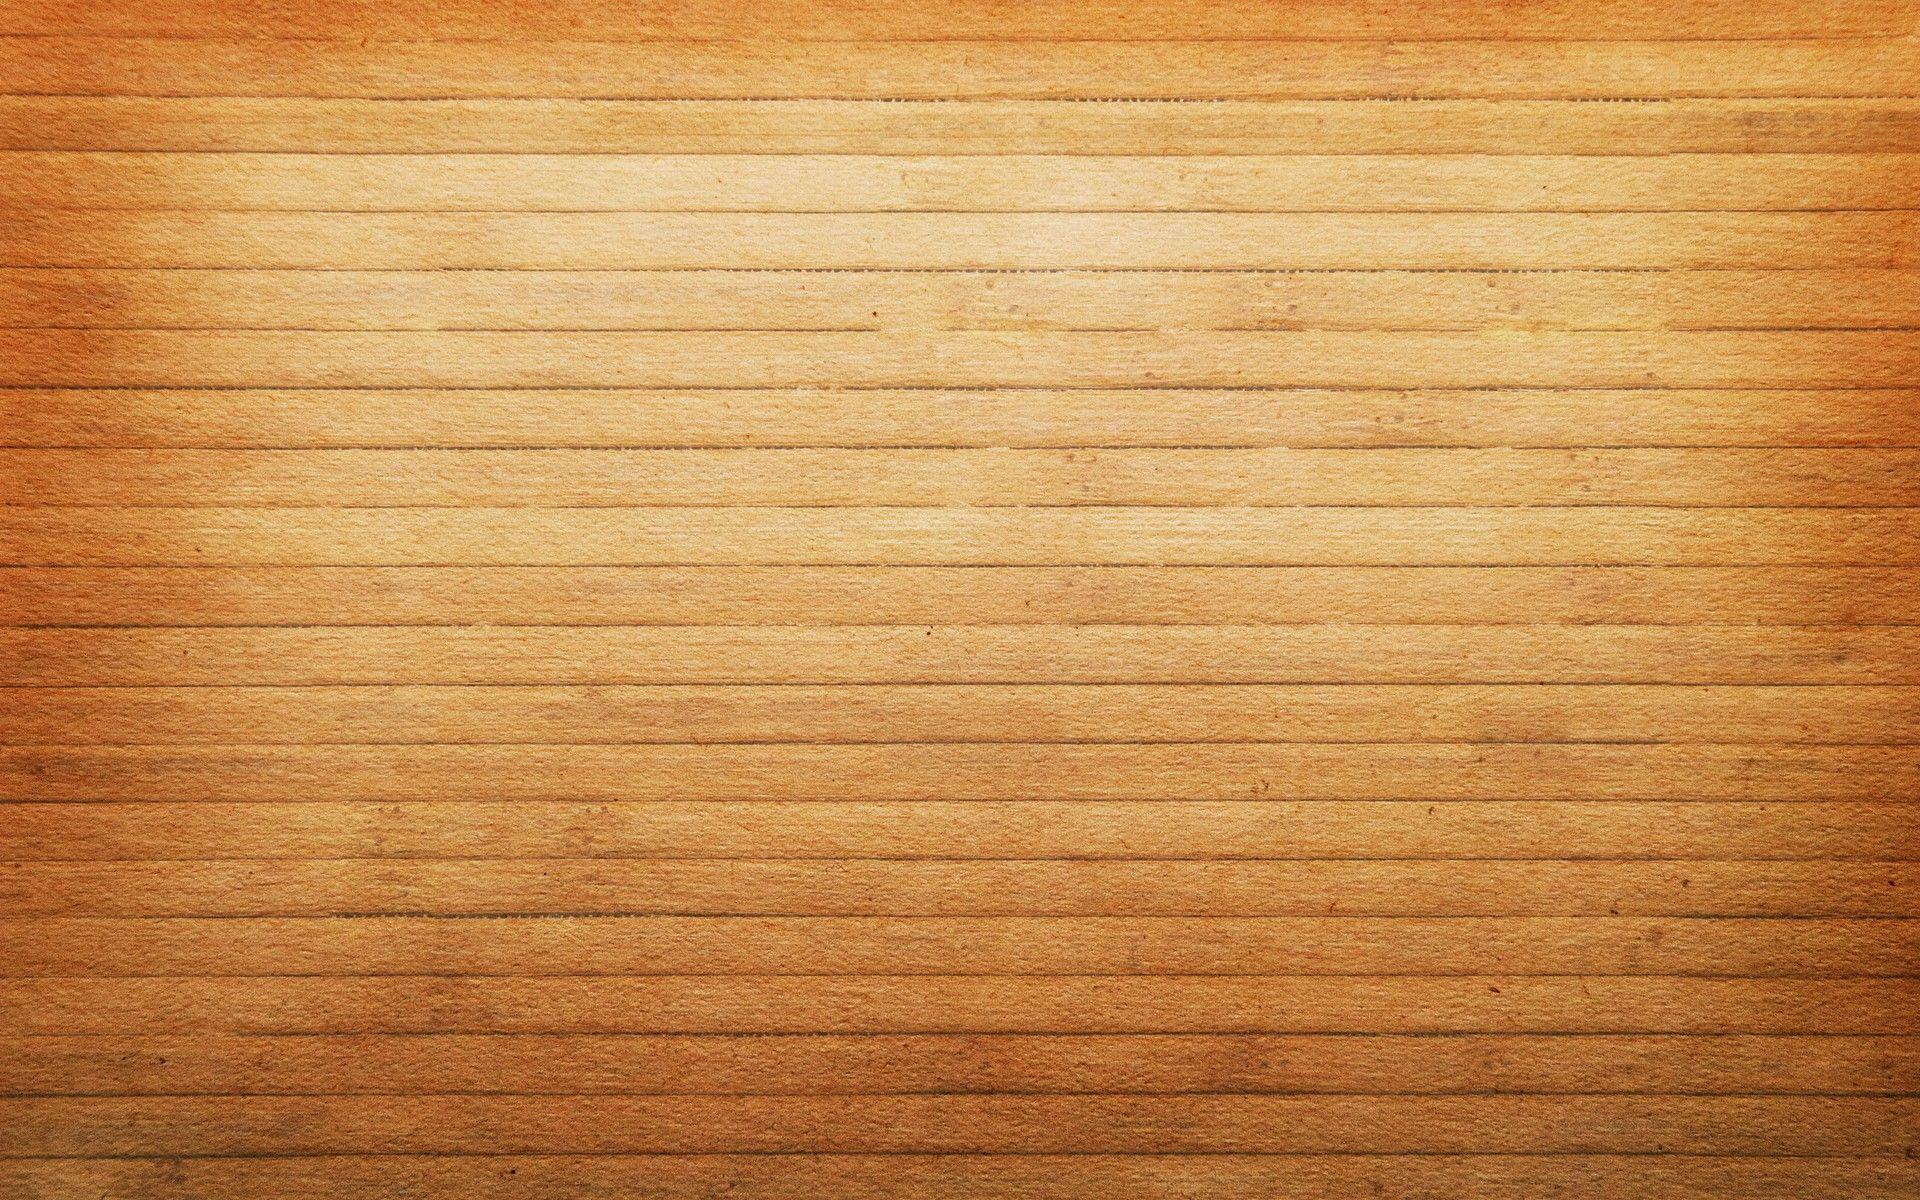 Hd Wood Backgrounds Wallpaper 1920x1200